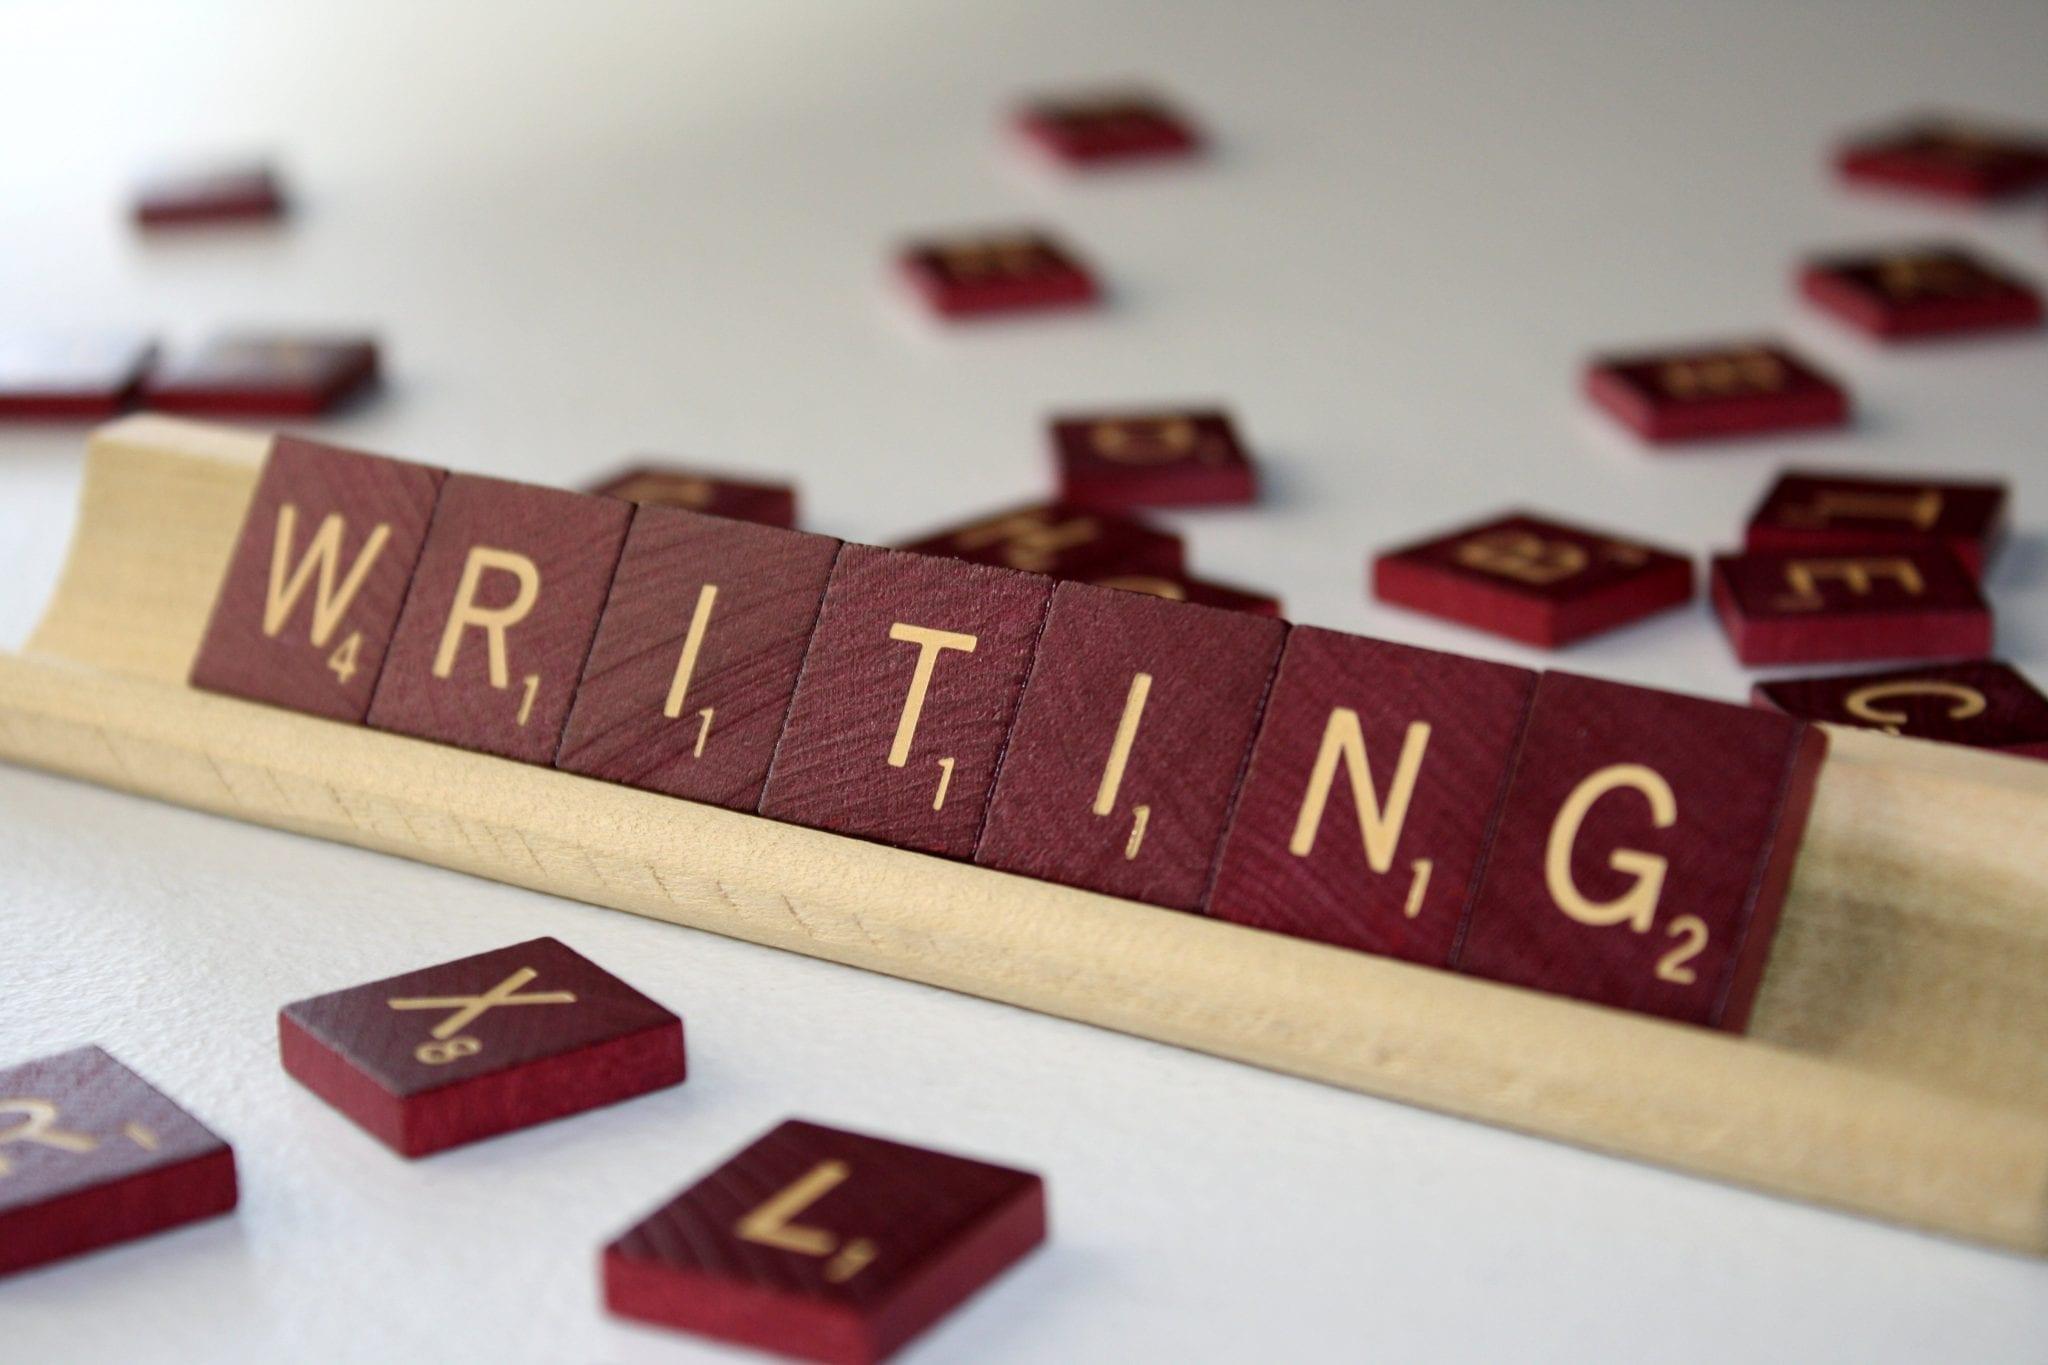 WRITING NIVEL C2 INGLES